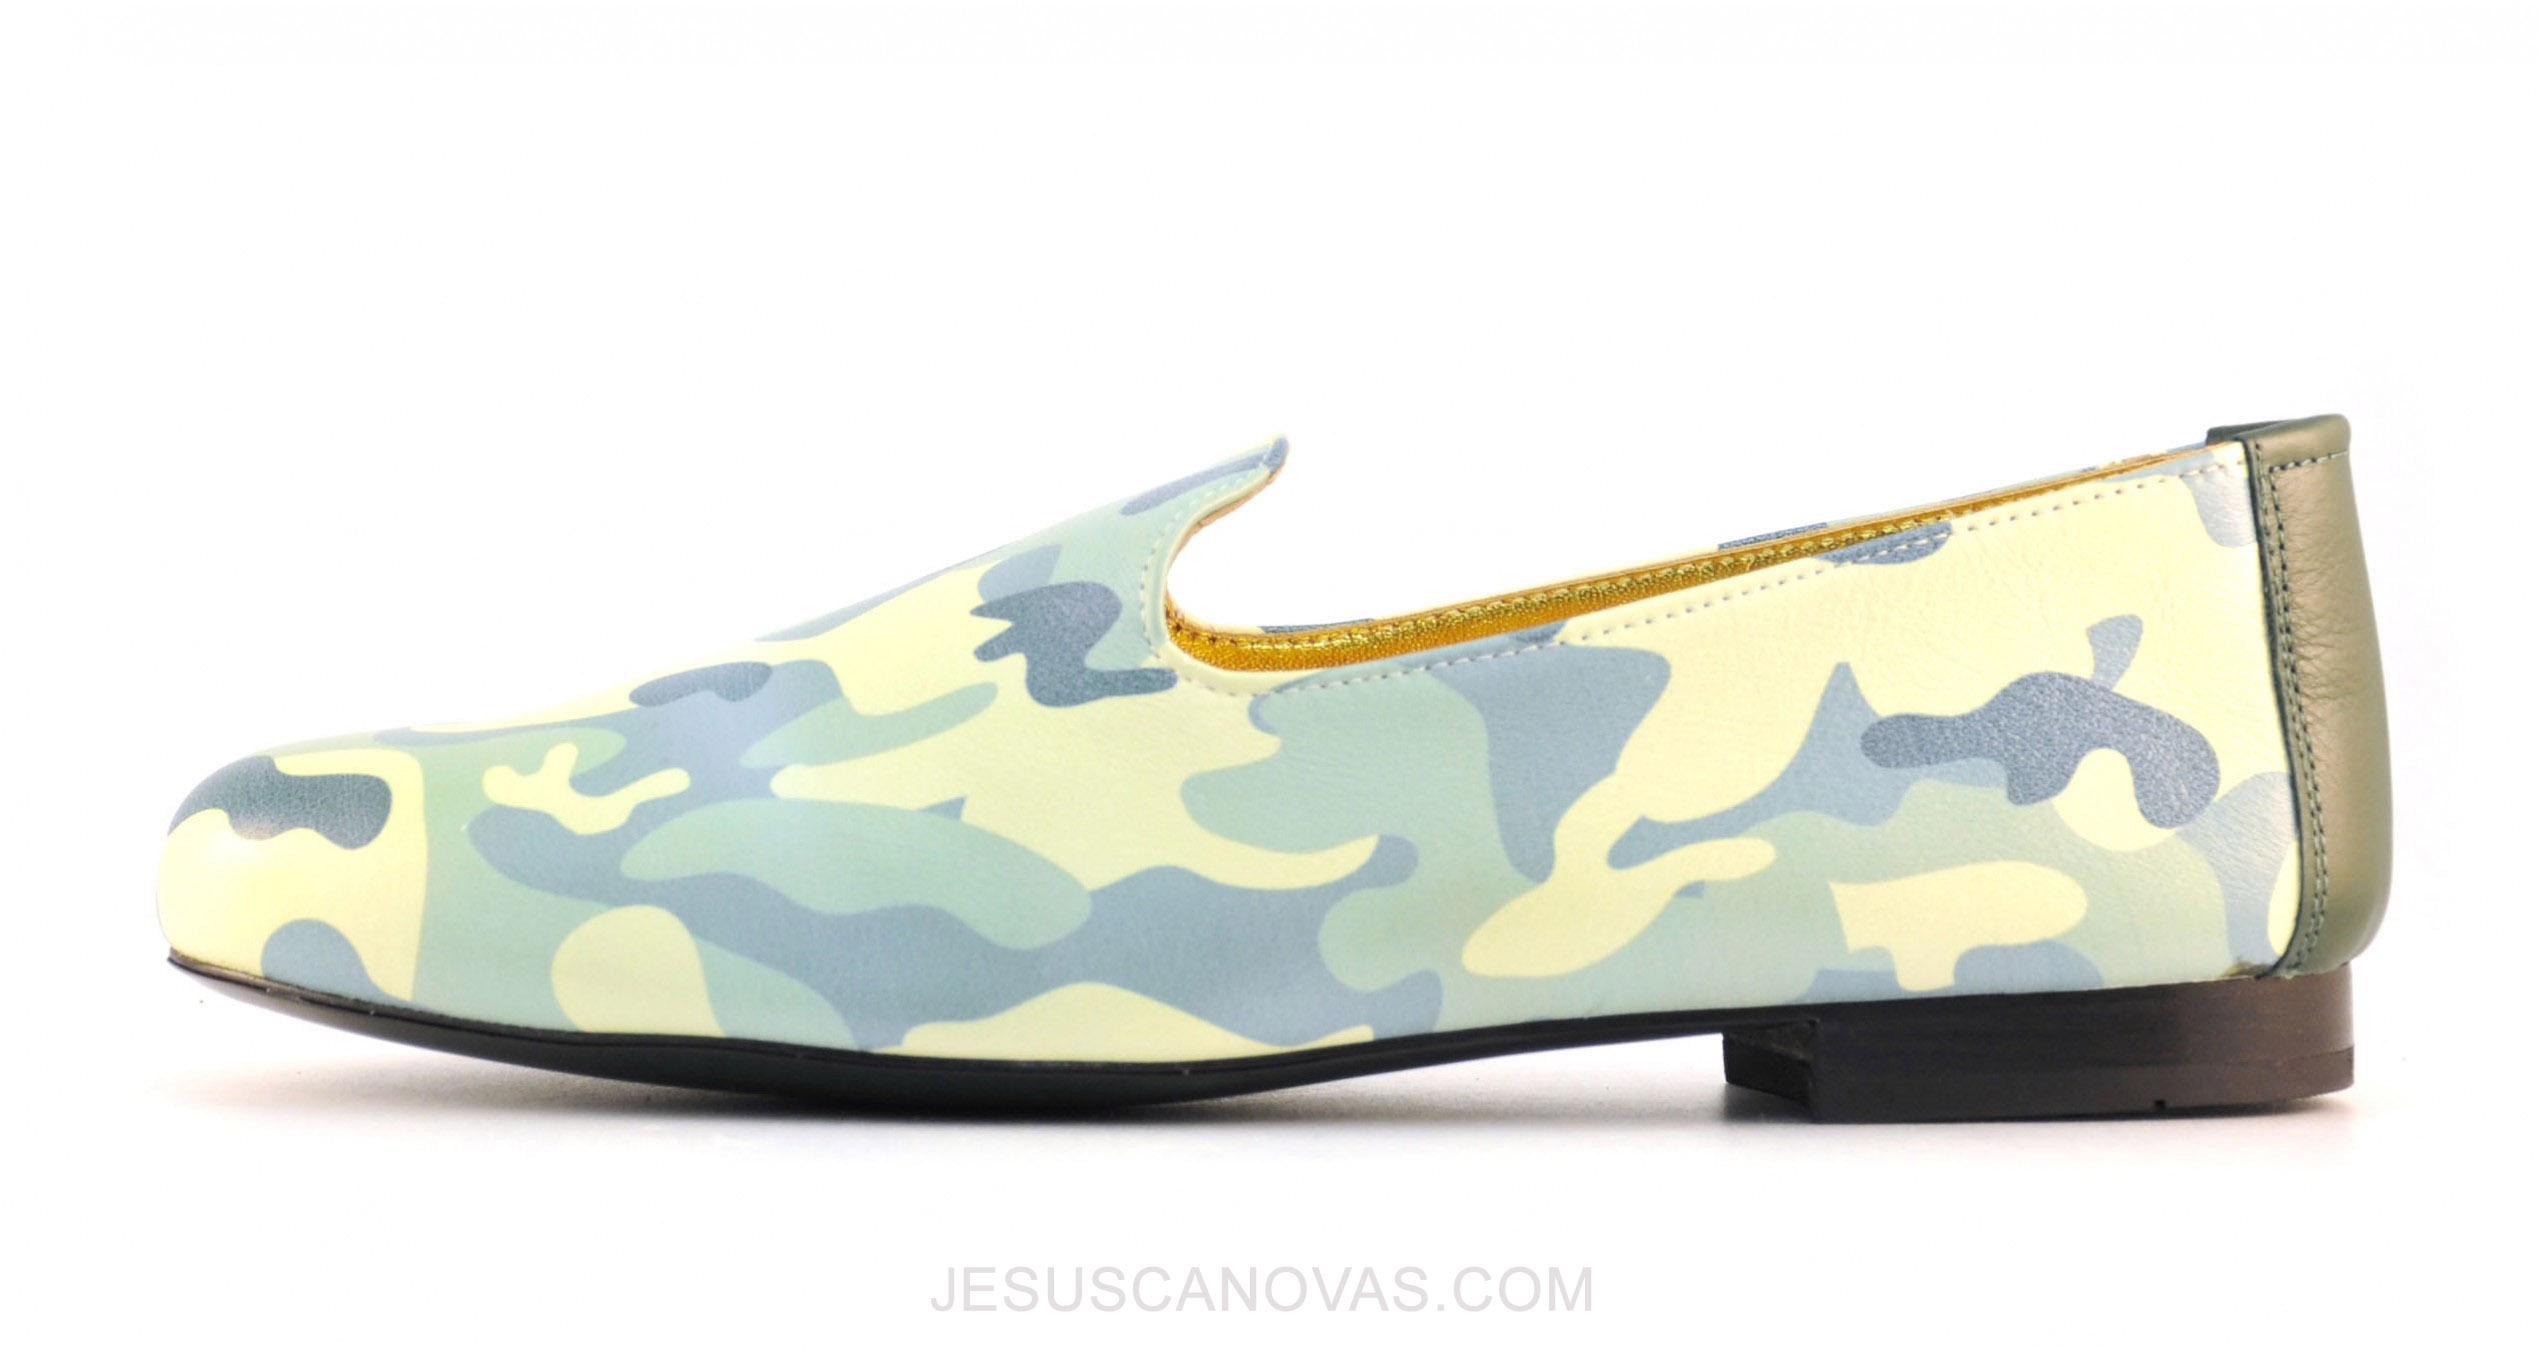 Foto 4 de Zapato Mocasin Mimic Camuflage - Napa Blanca Impresa